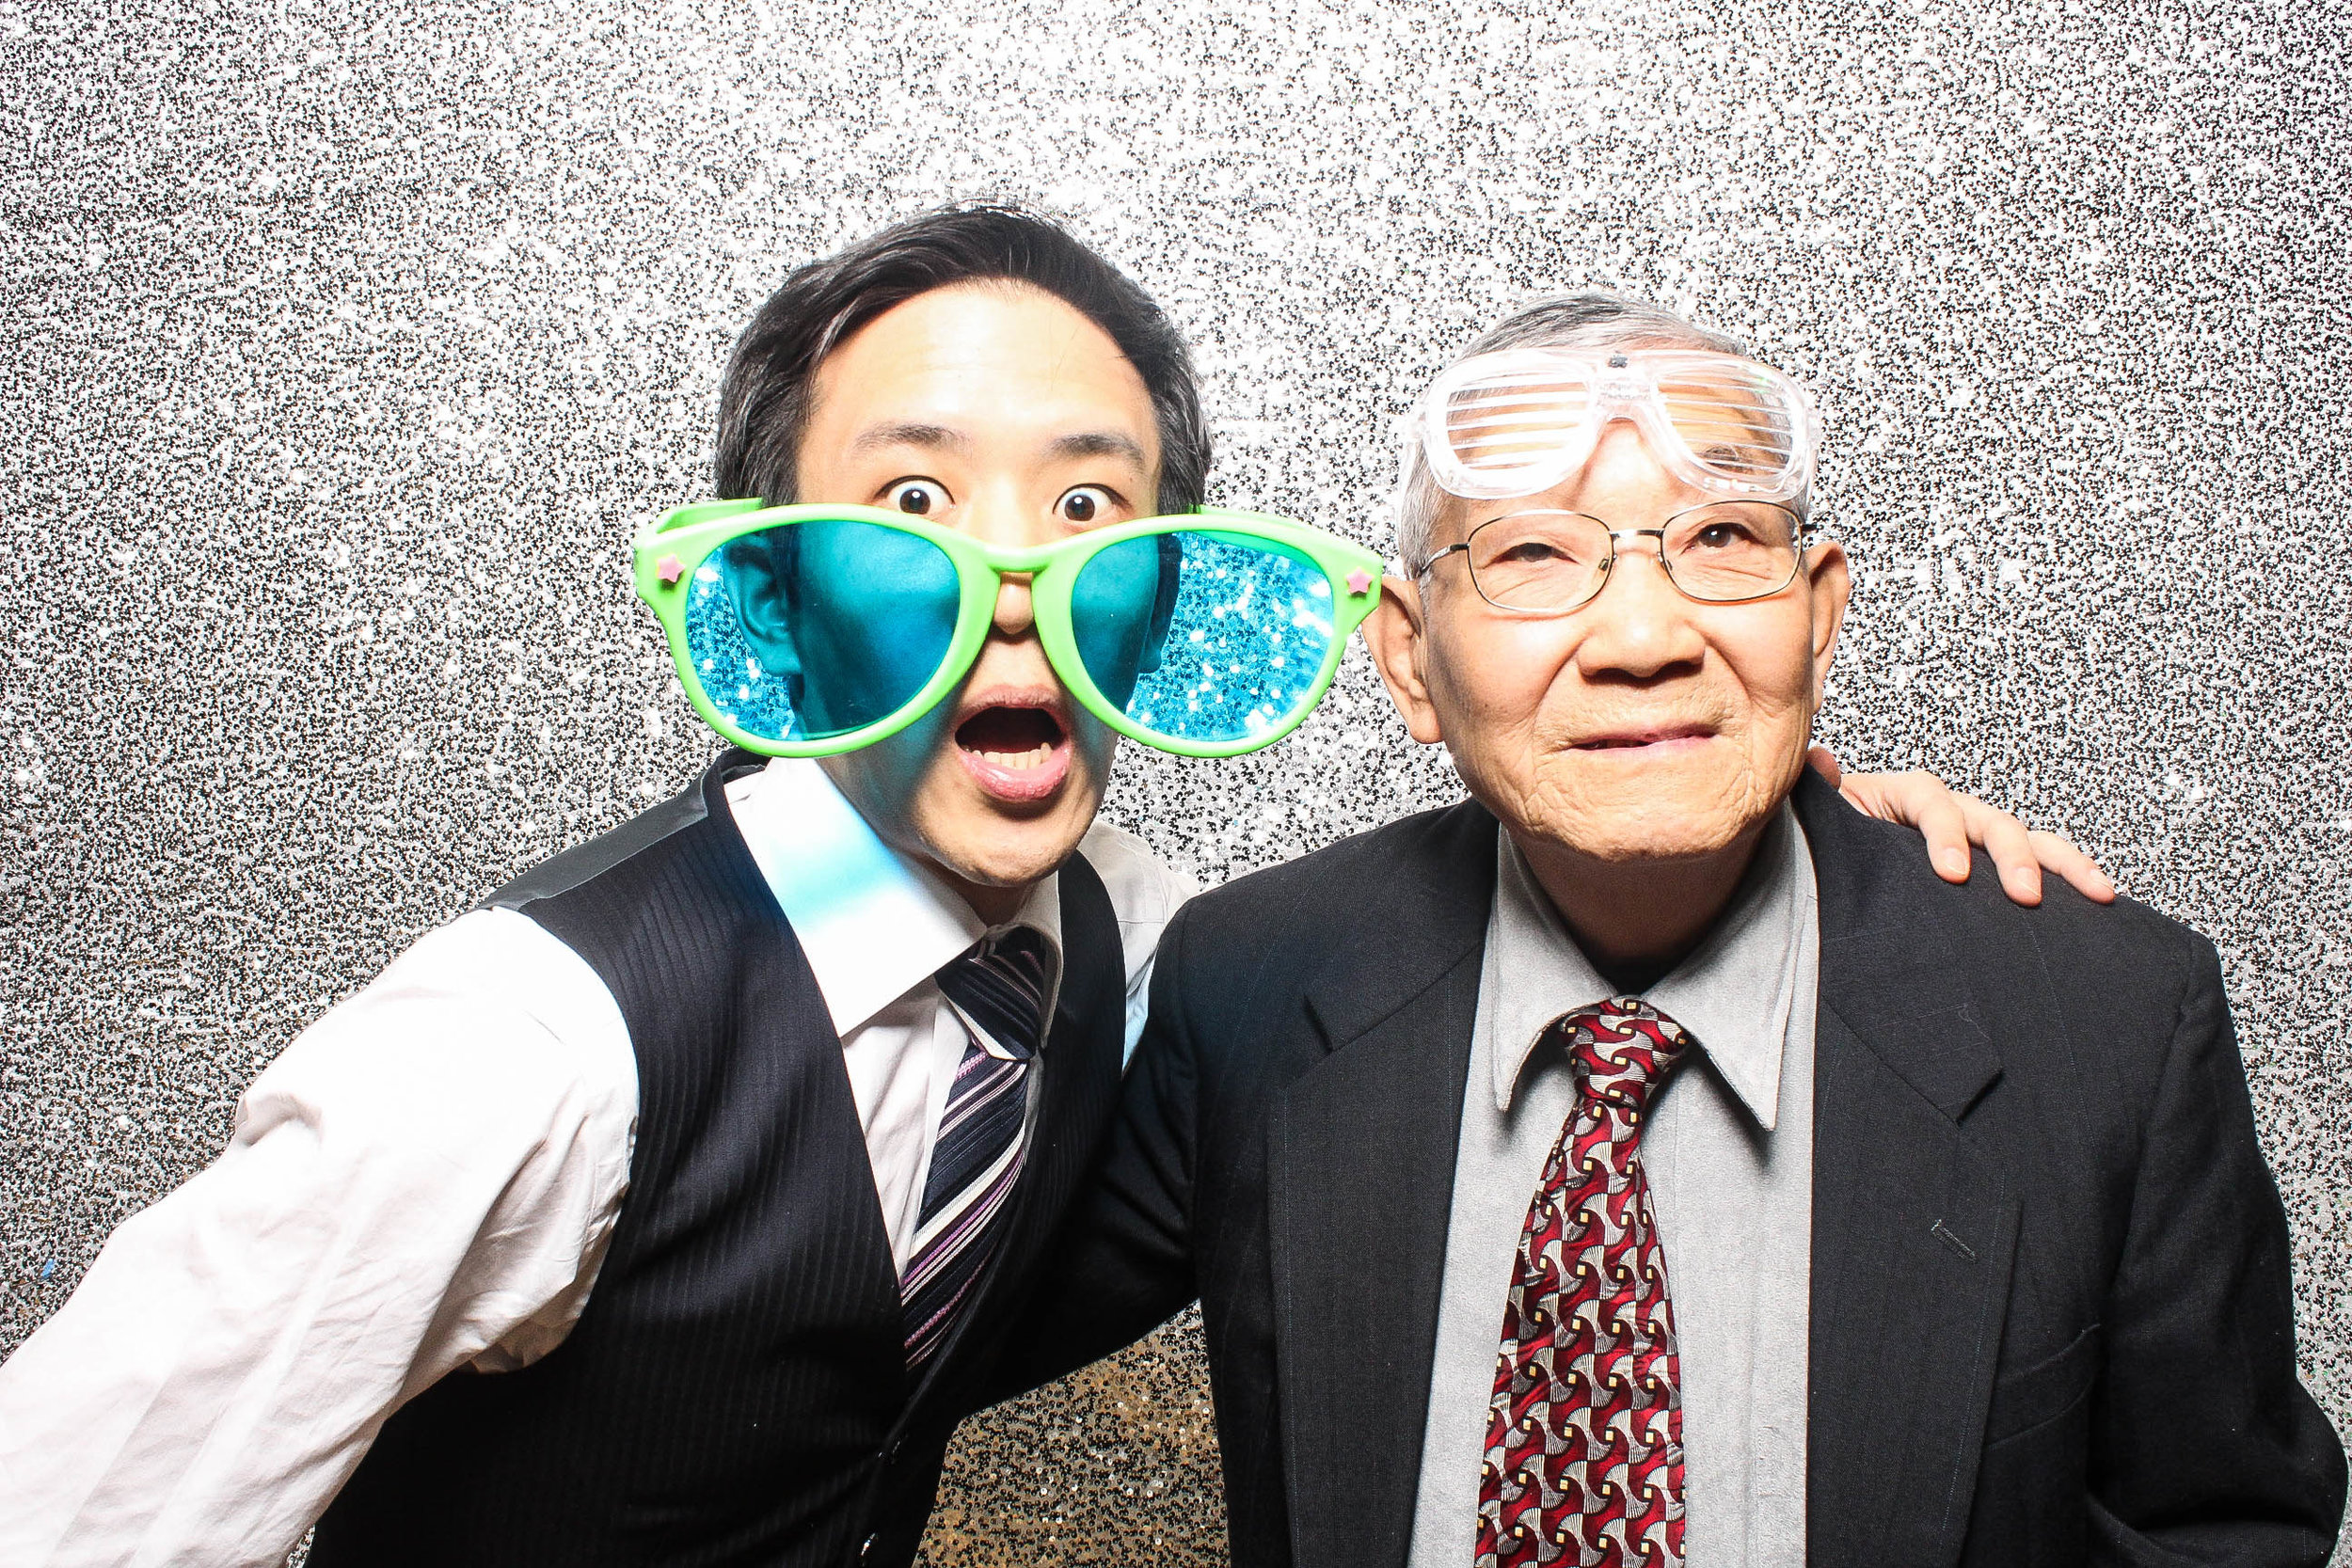 20181116_Matsuzaki-169.jpg